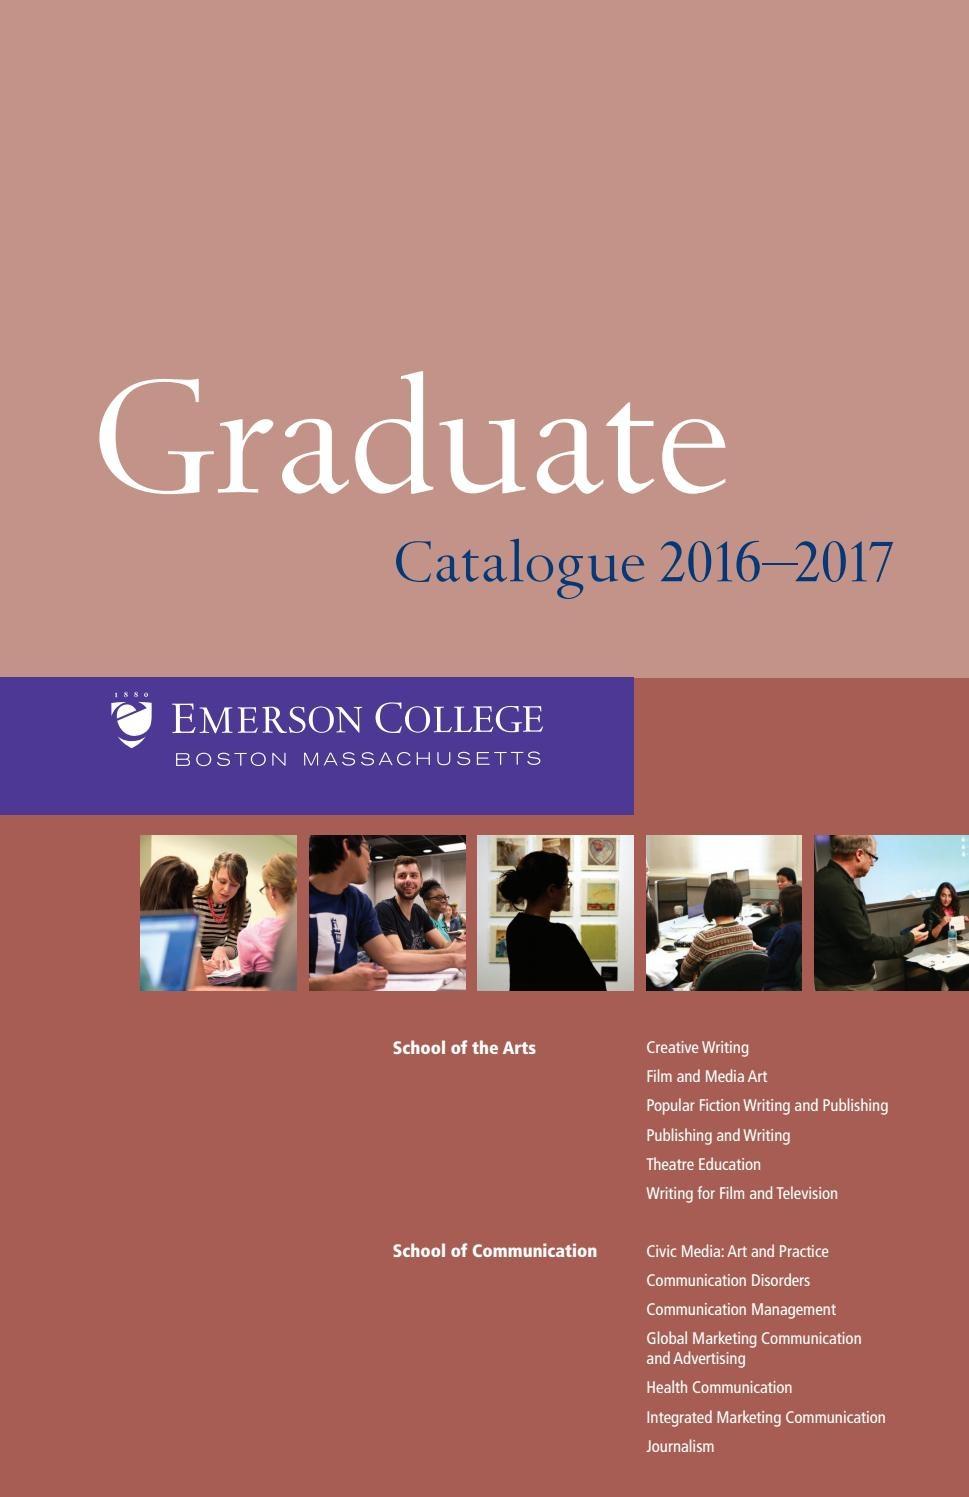 Emerson College Academic Calendar Calendar Template 2018 89uj